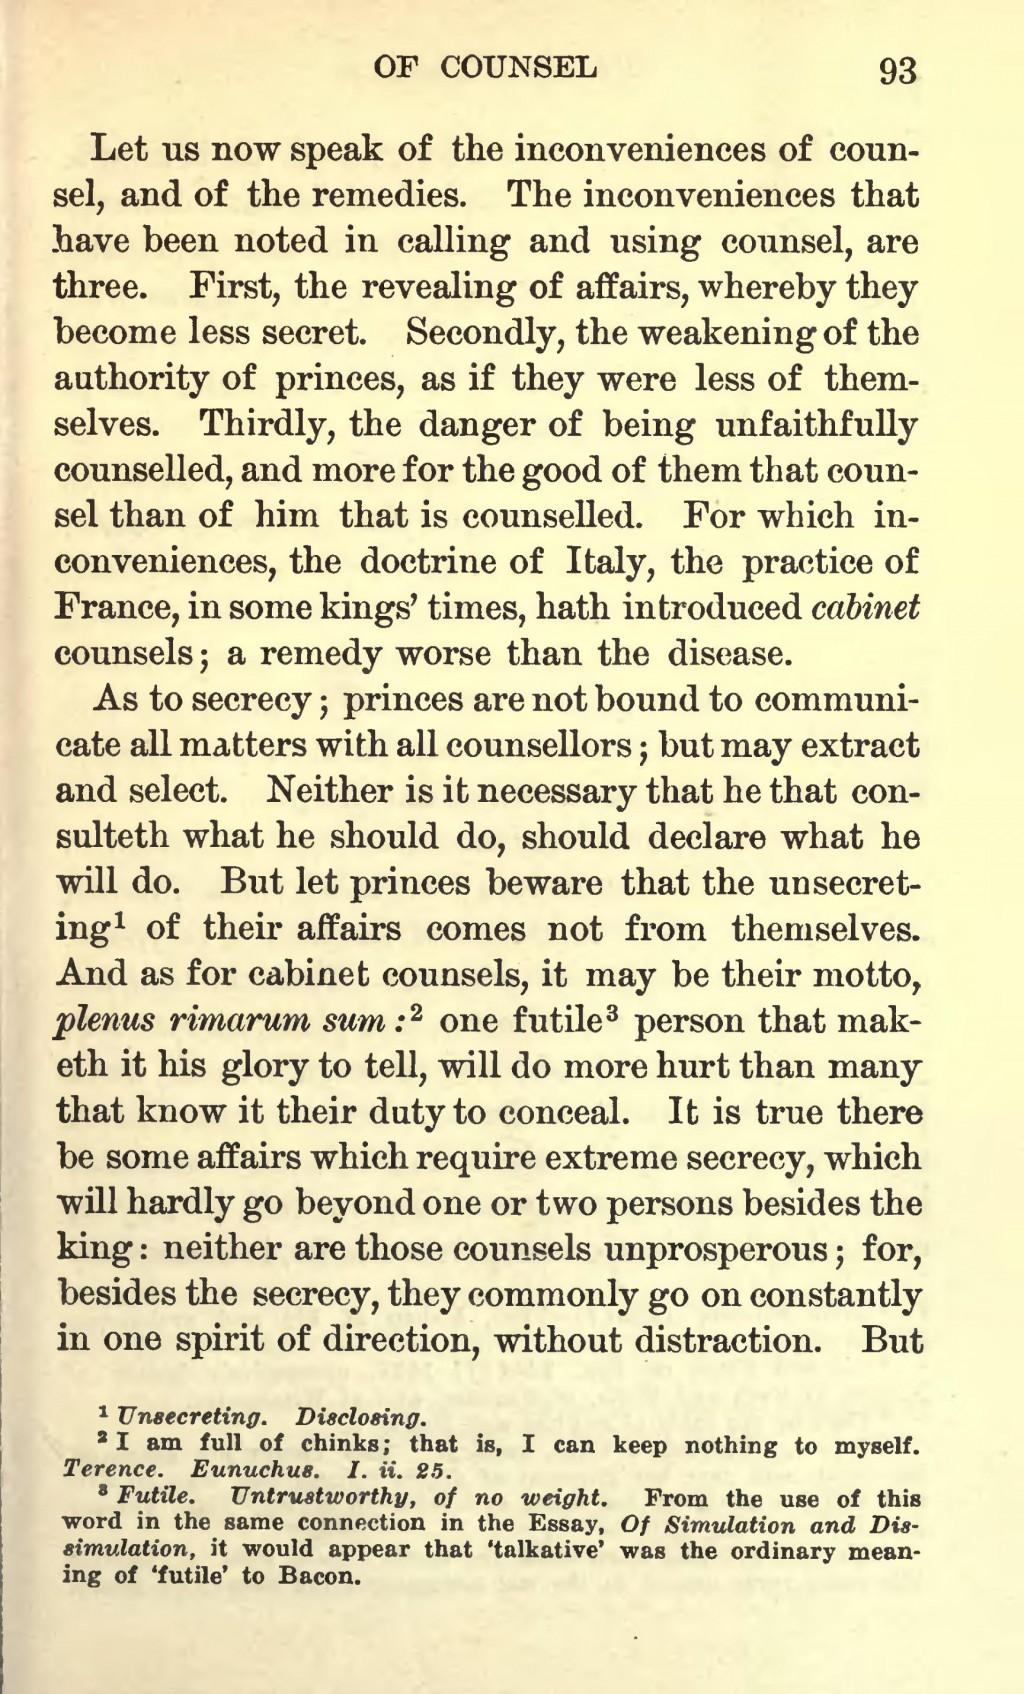 007 Page203 1728px Essays Of Francis Bacon 1908 Scott Djvu Bacons Essay Amazing In Urdu Pdf Truth Summary Large